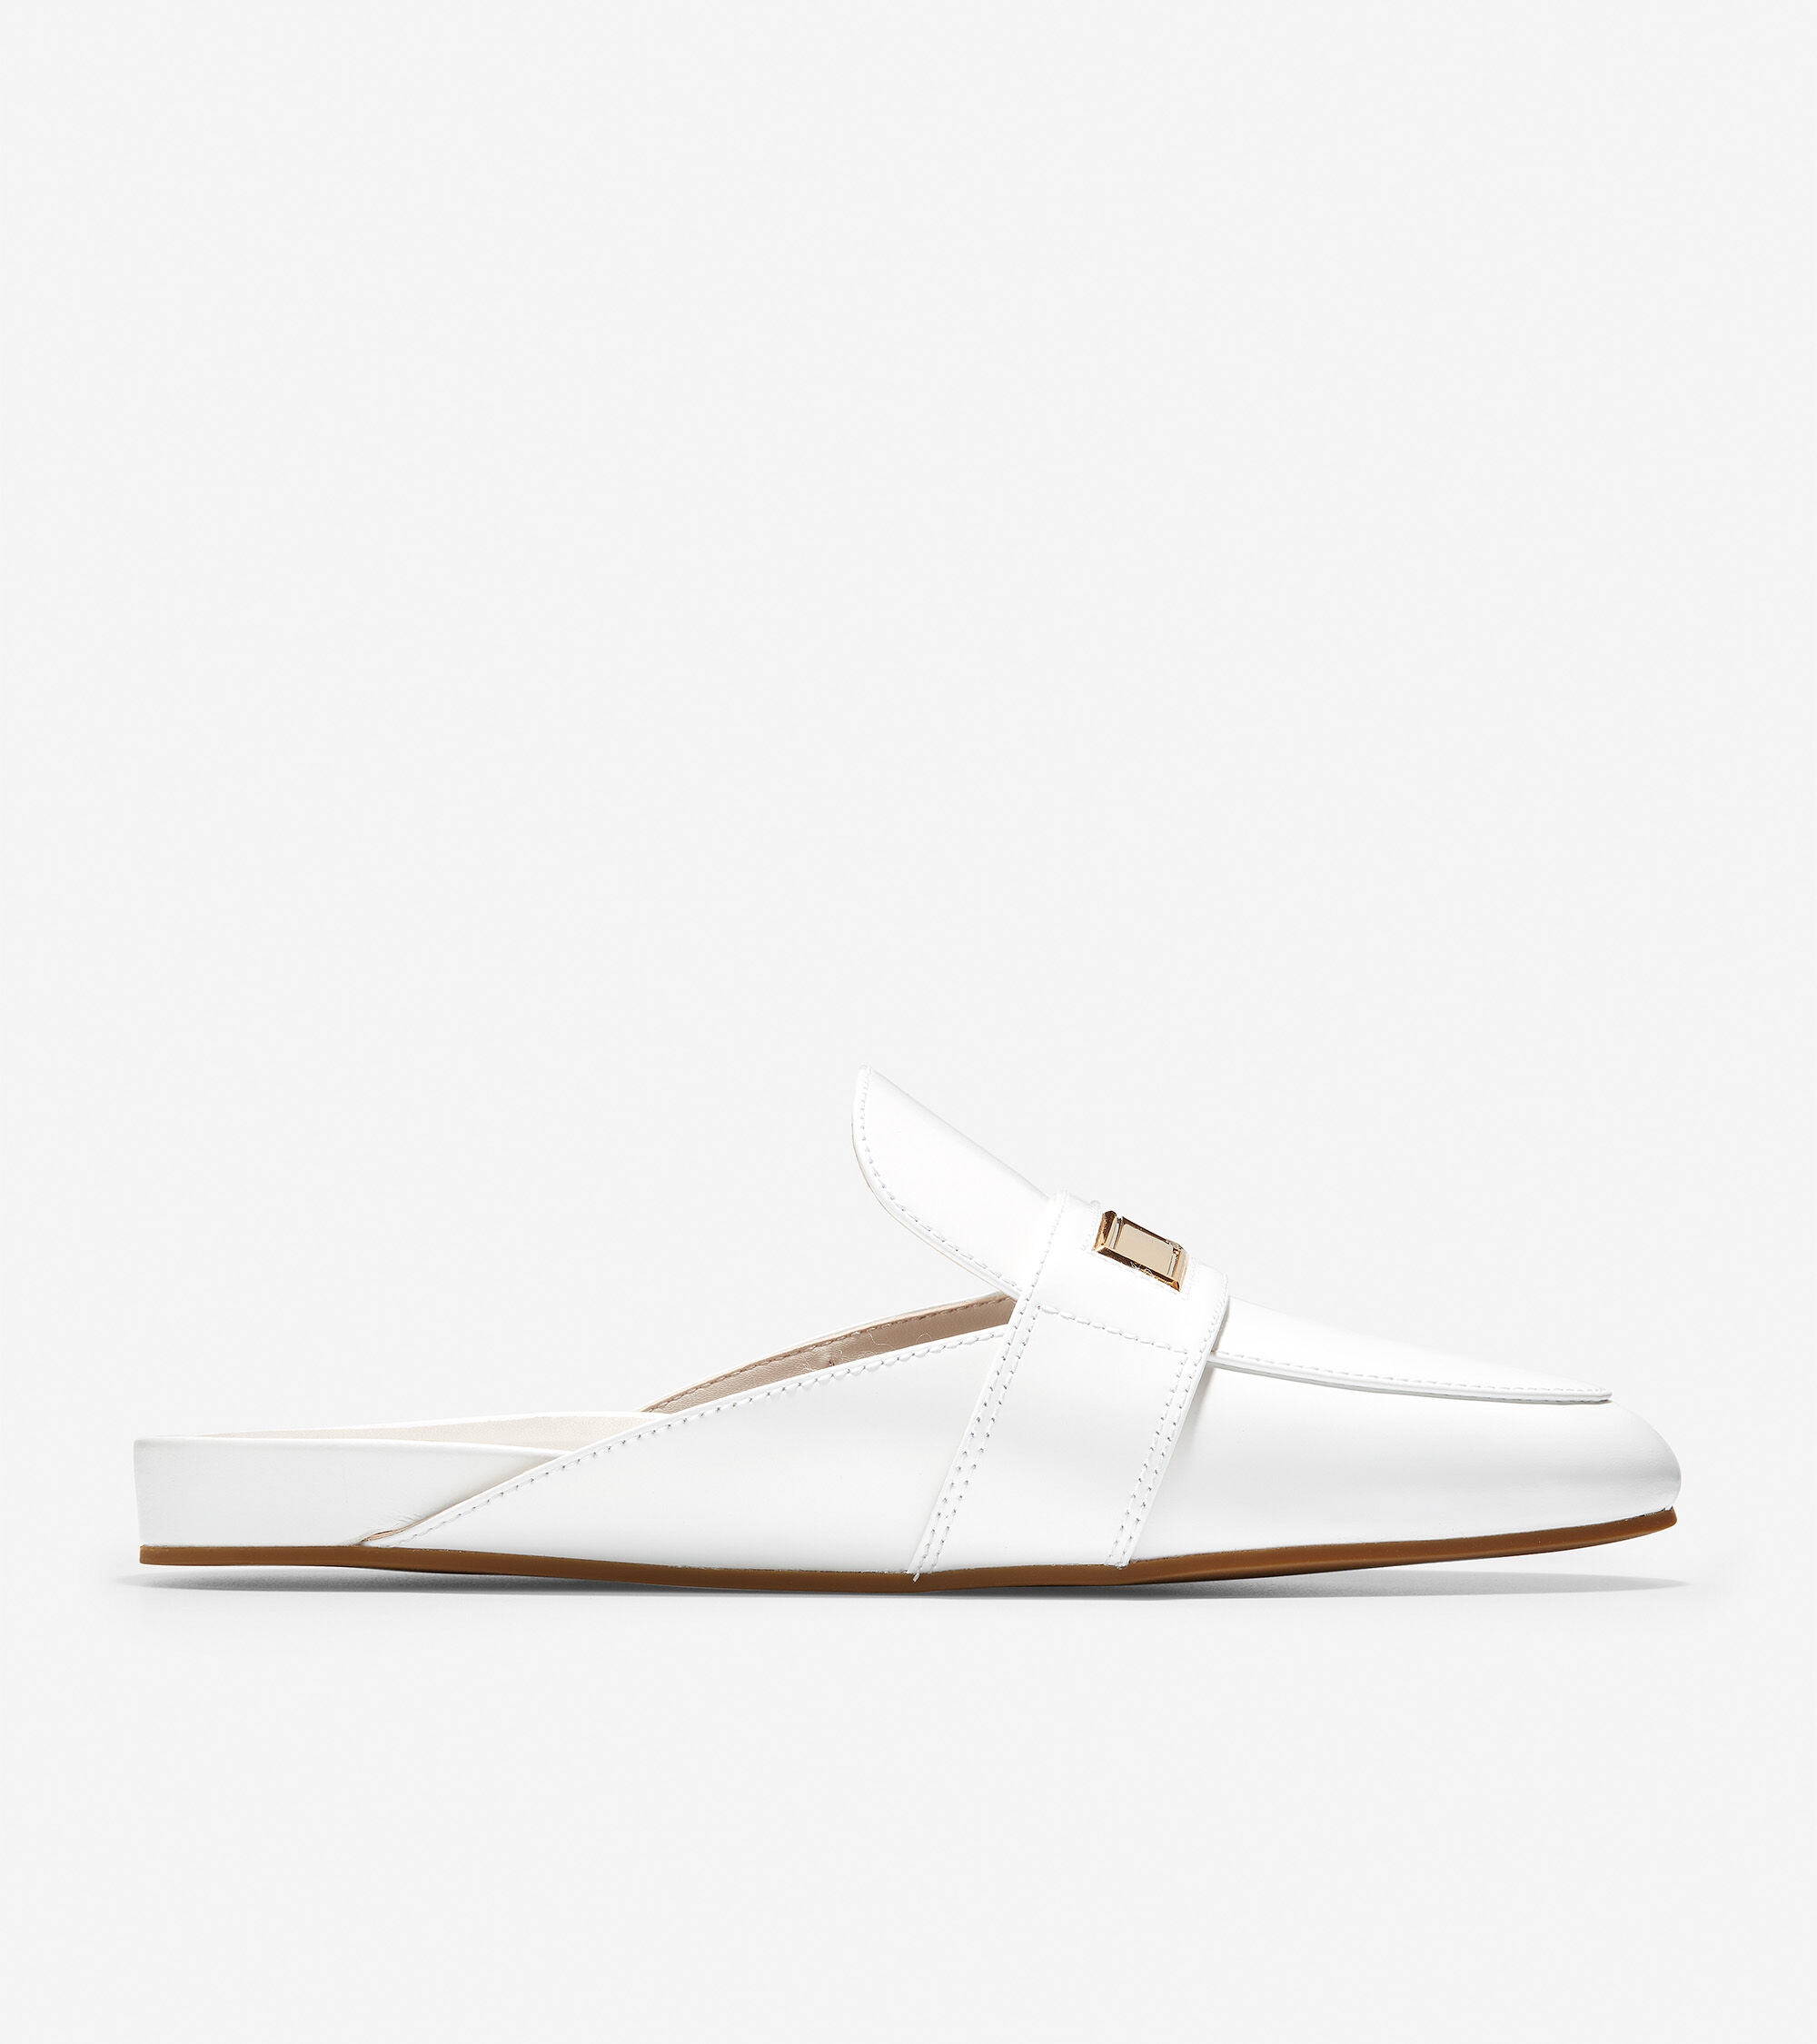 Aria Mule in Optic White Box Leather